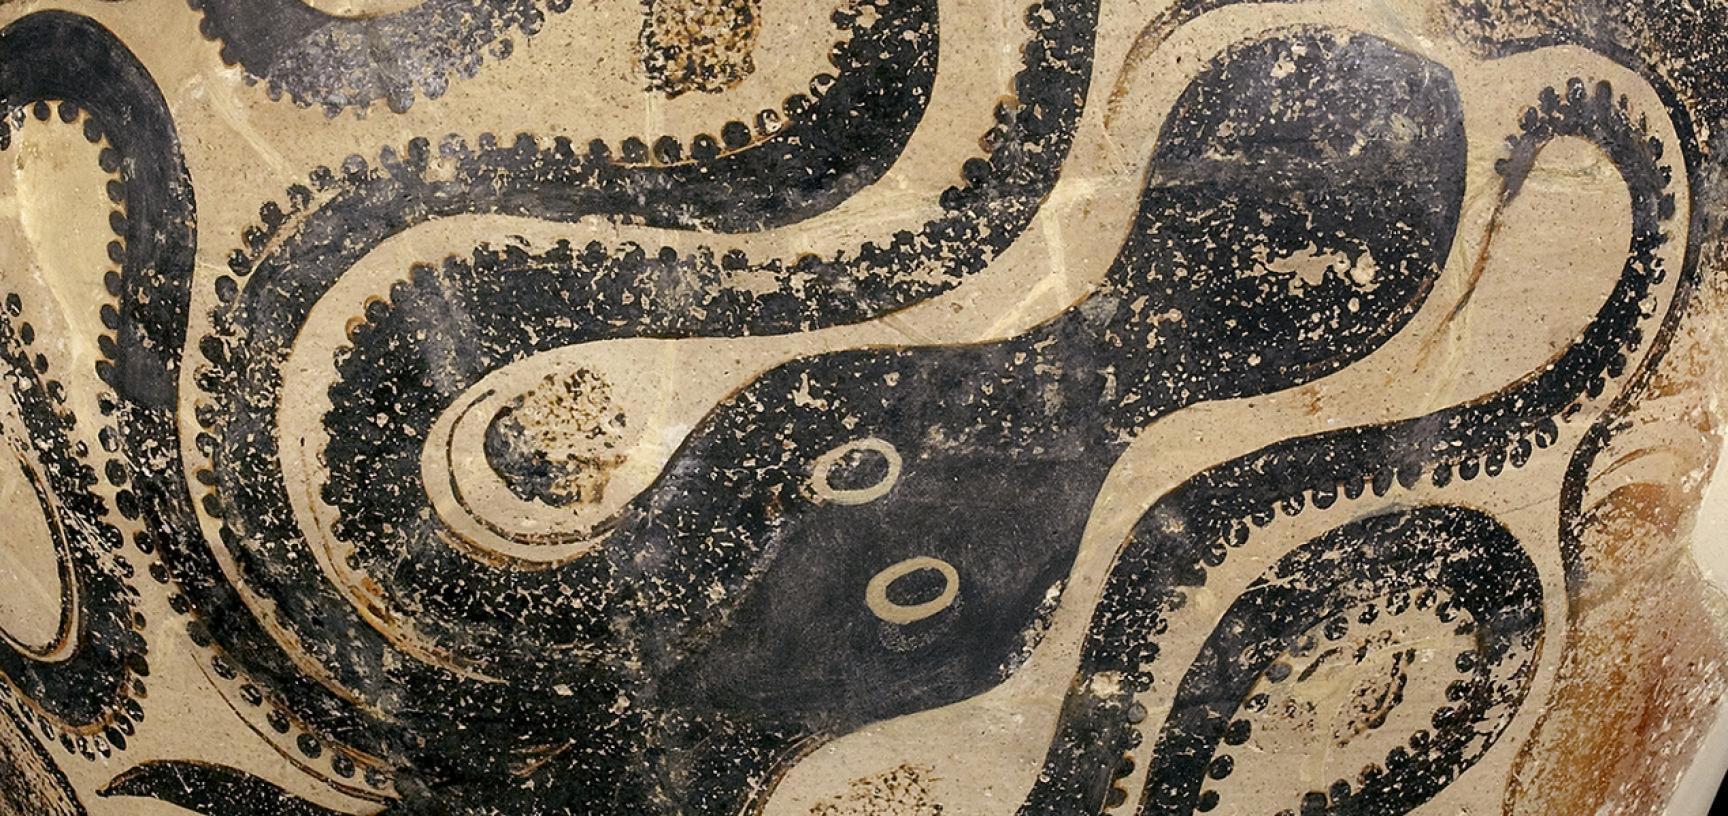 Knossos storage jar (detail)